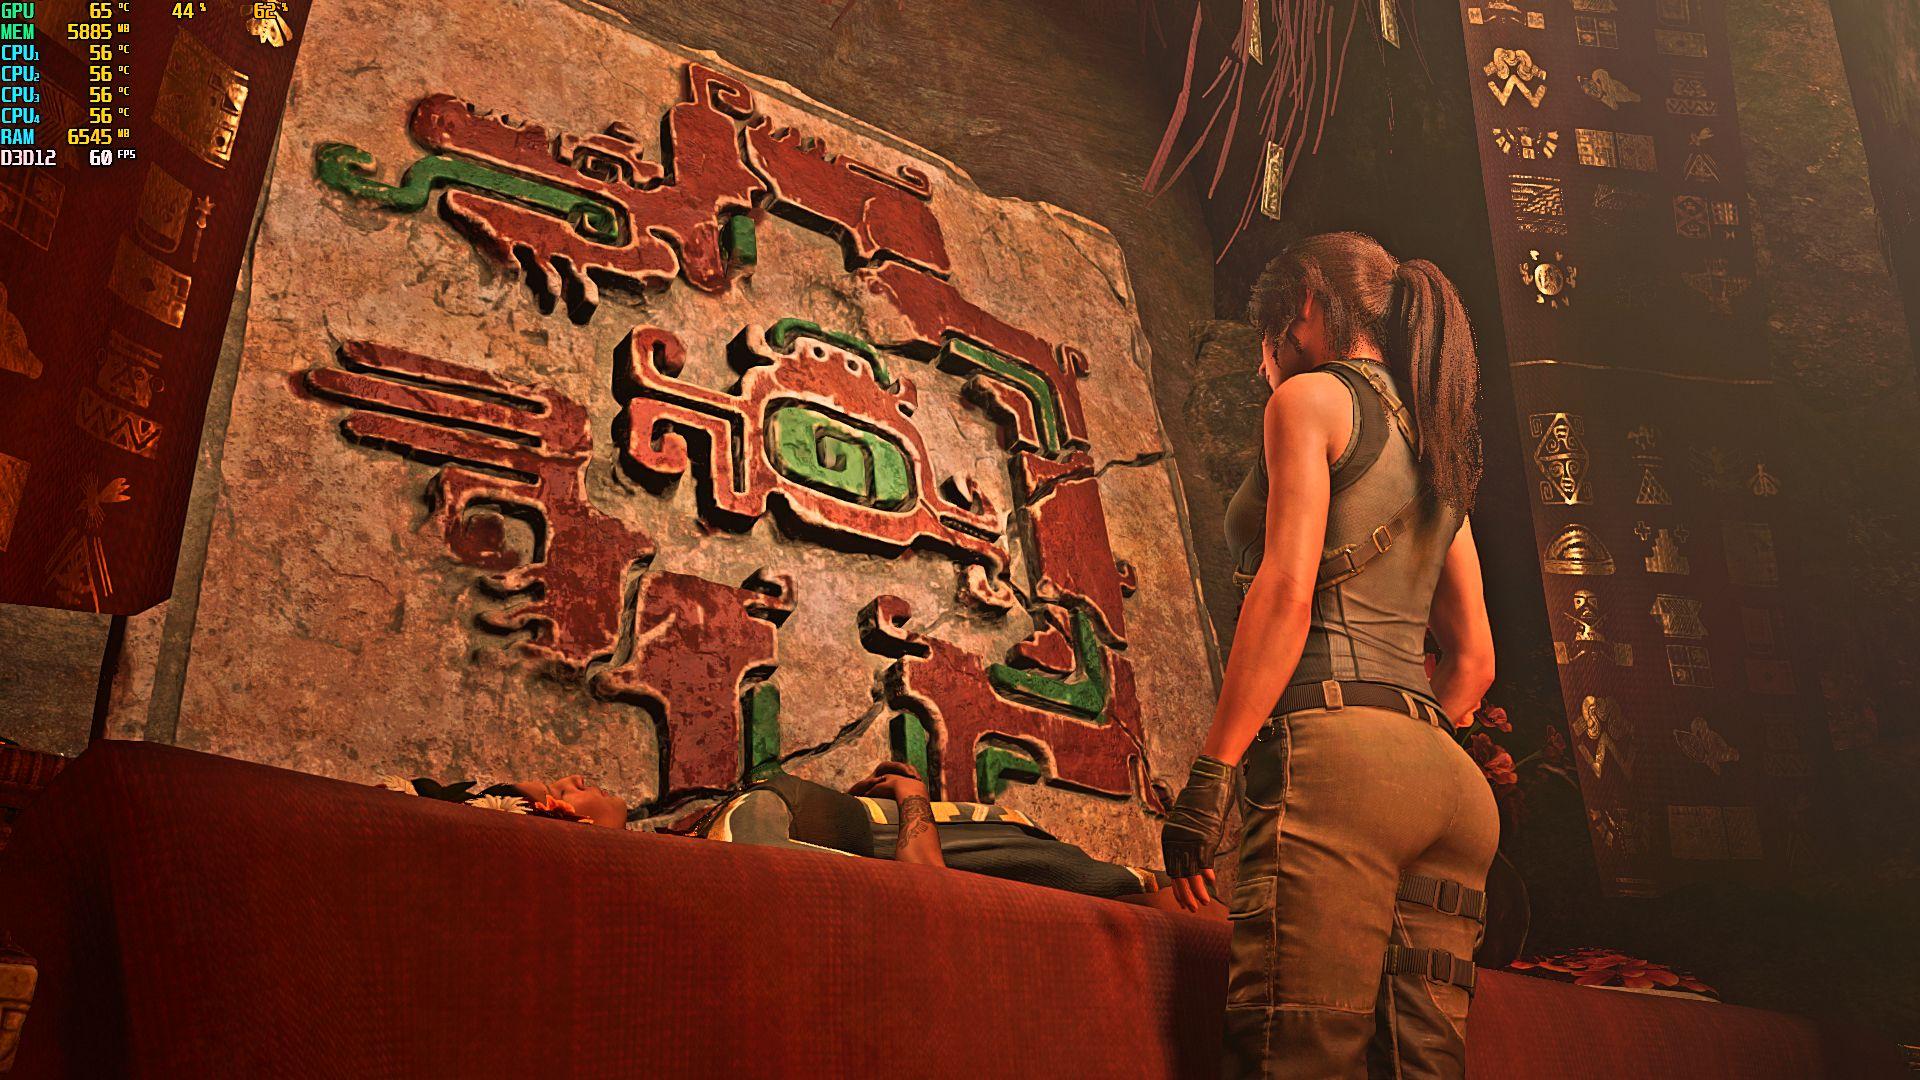 000639.Jpg - Shadow of the Tomb Raider